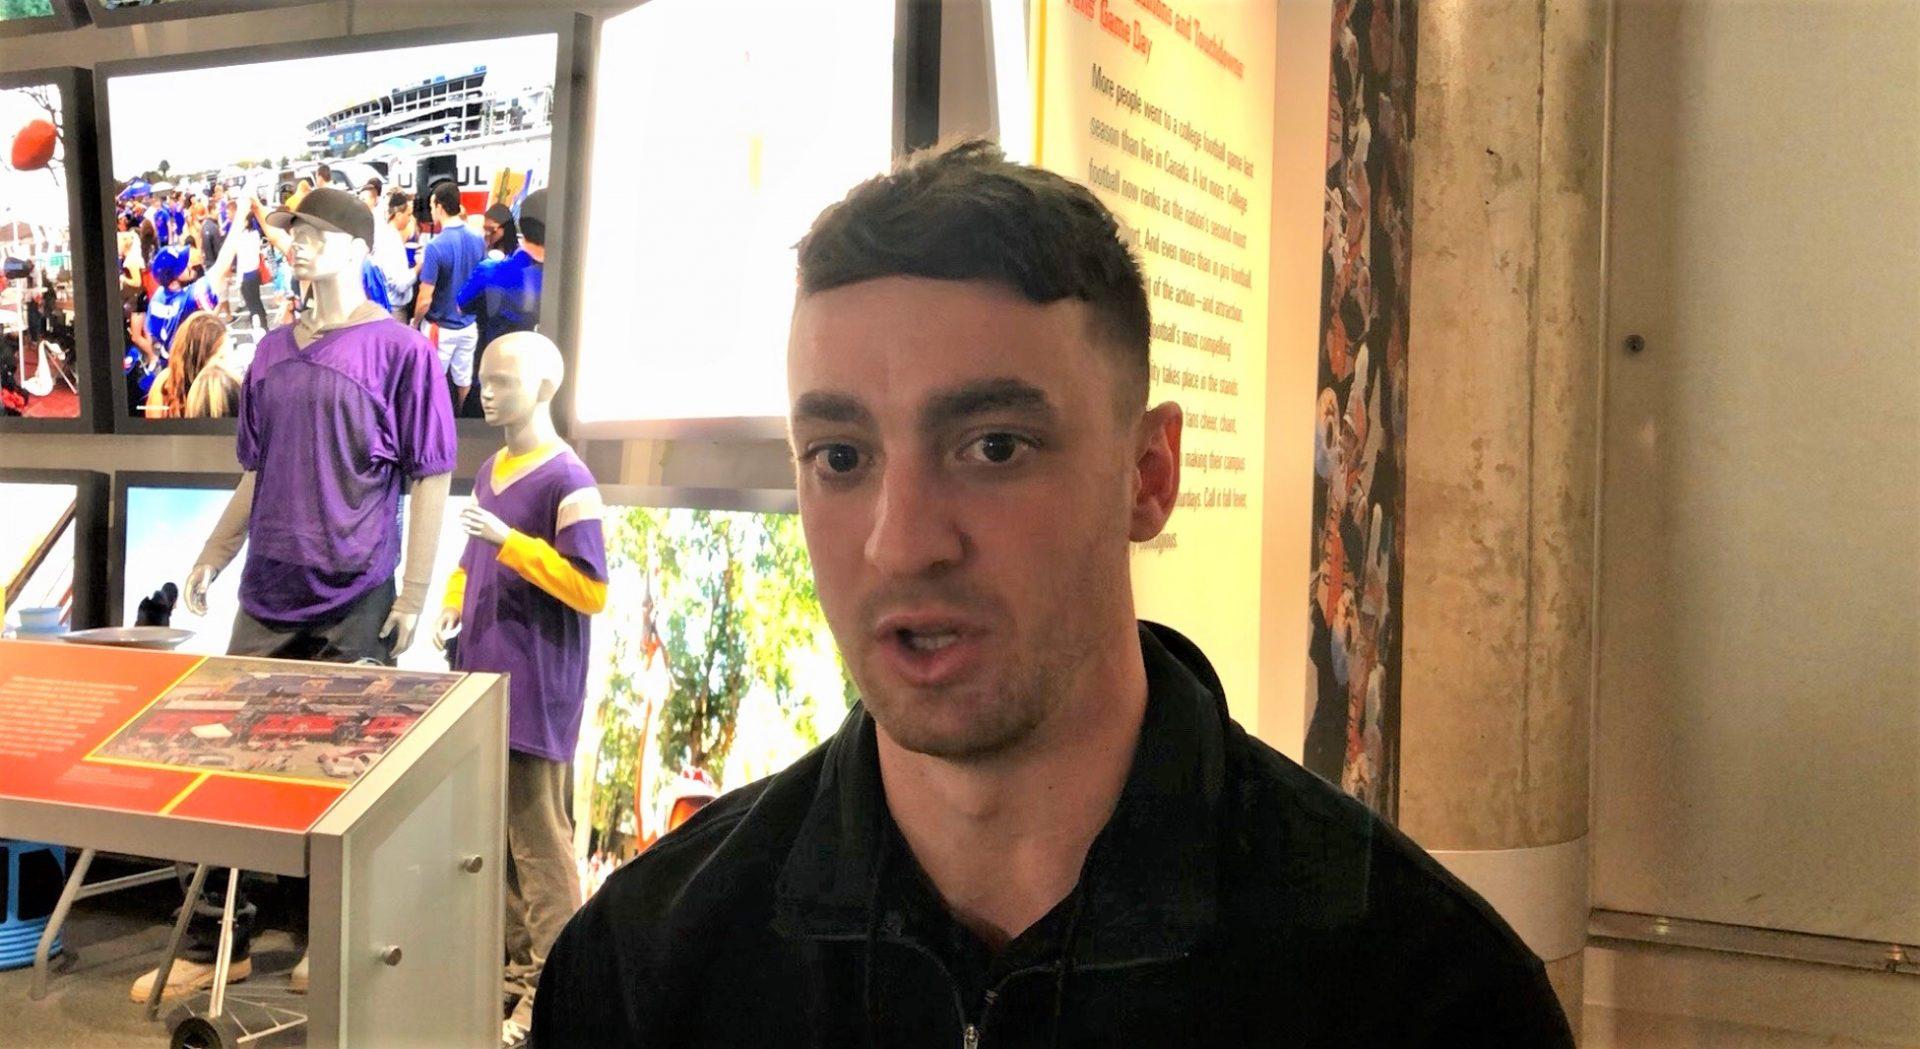 Max Duffy wins Ray Guy Award as nation's top punter